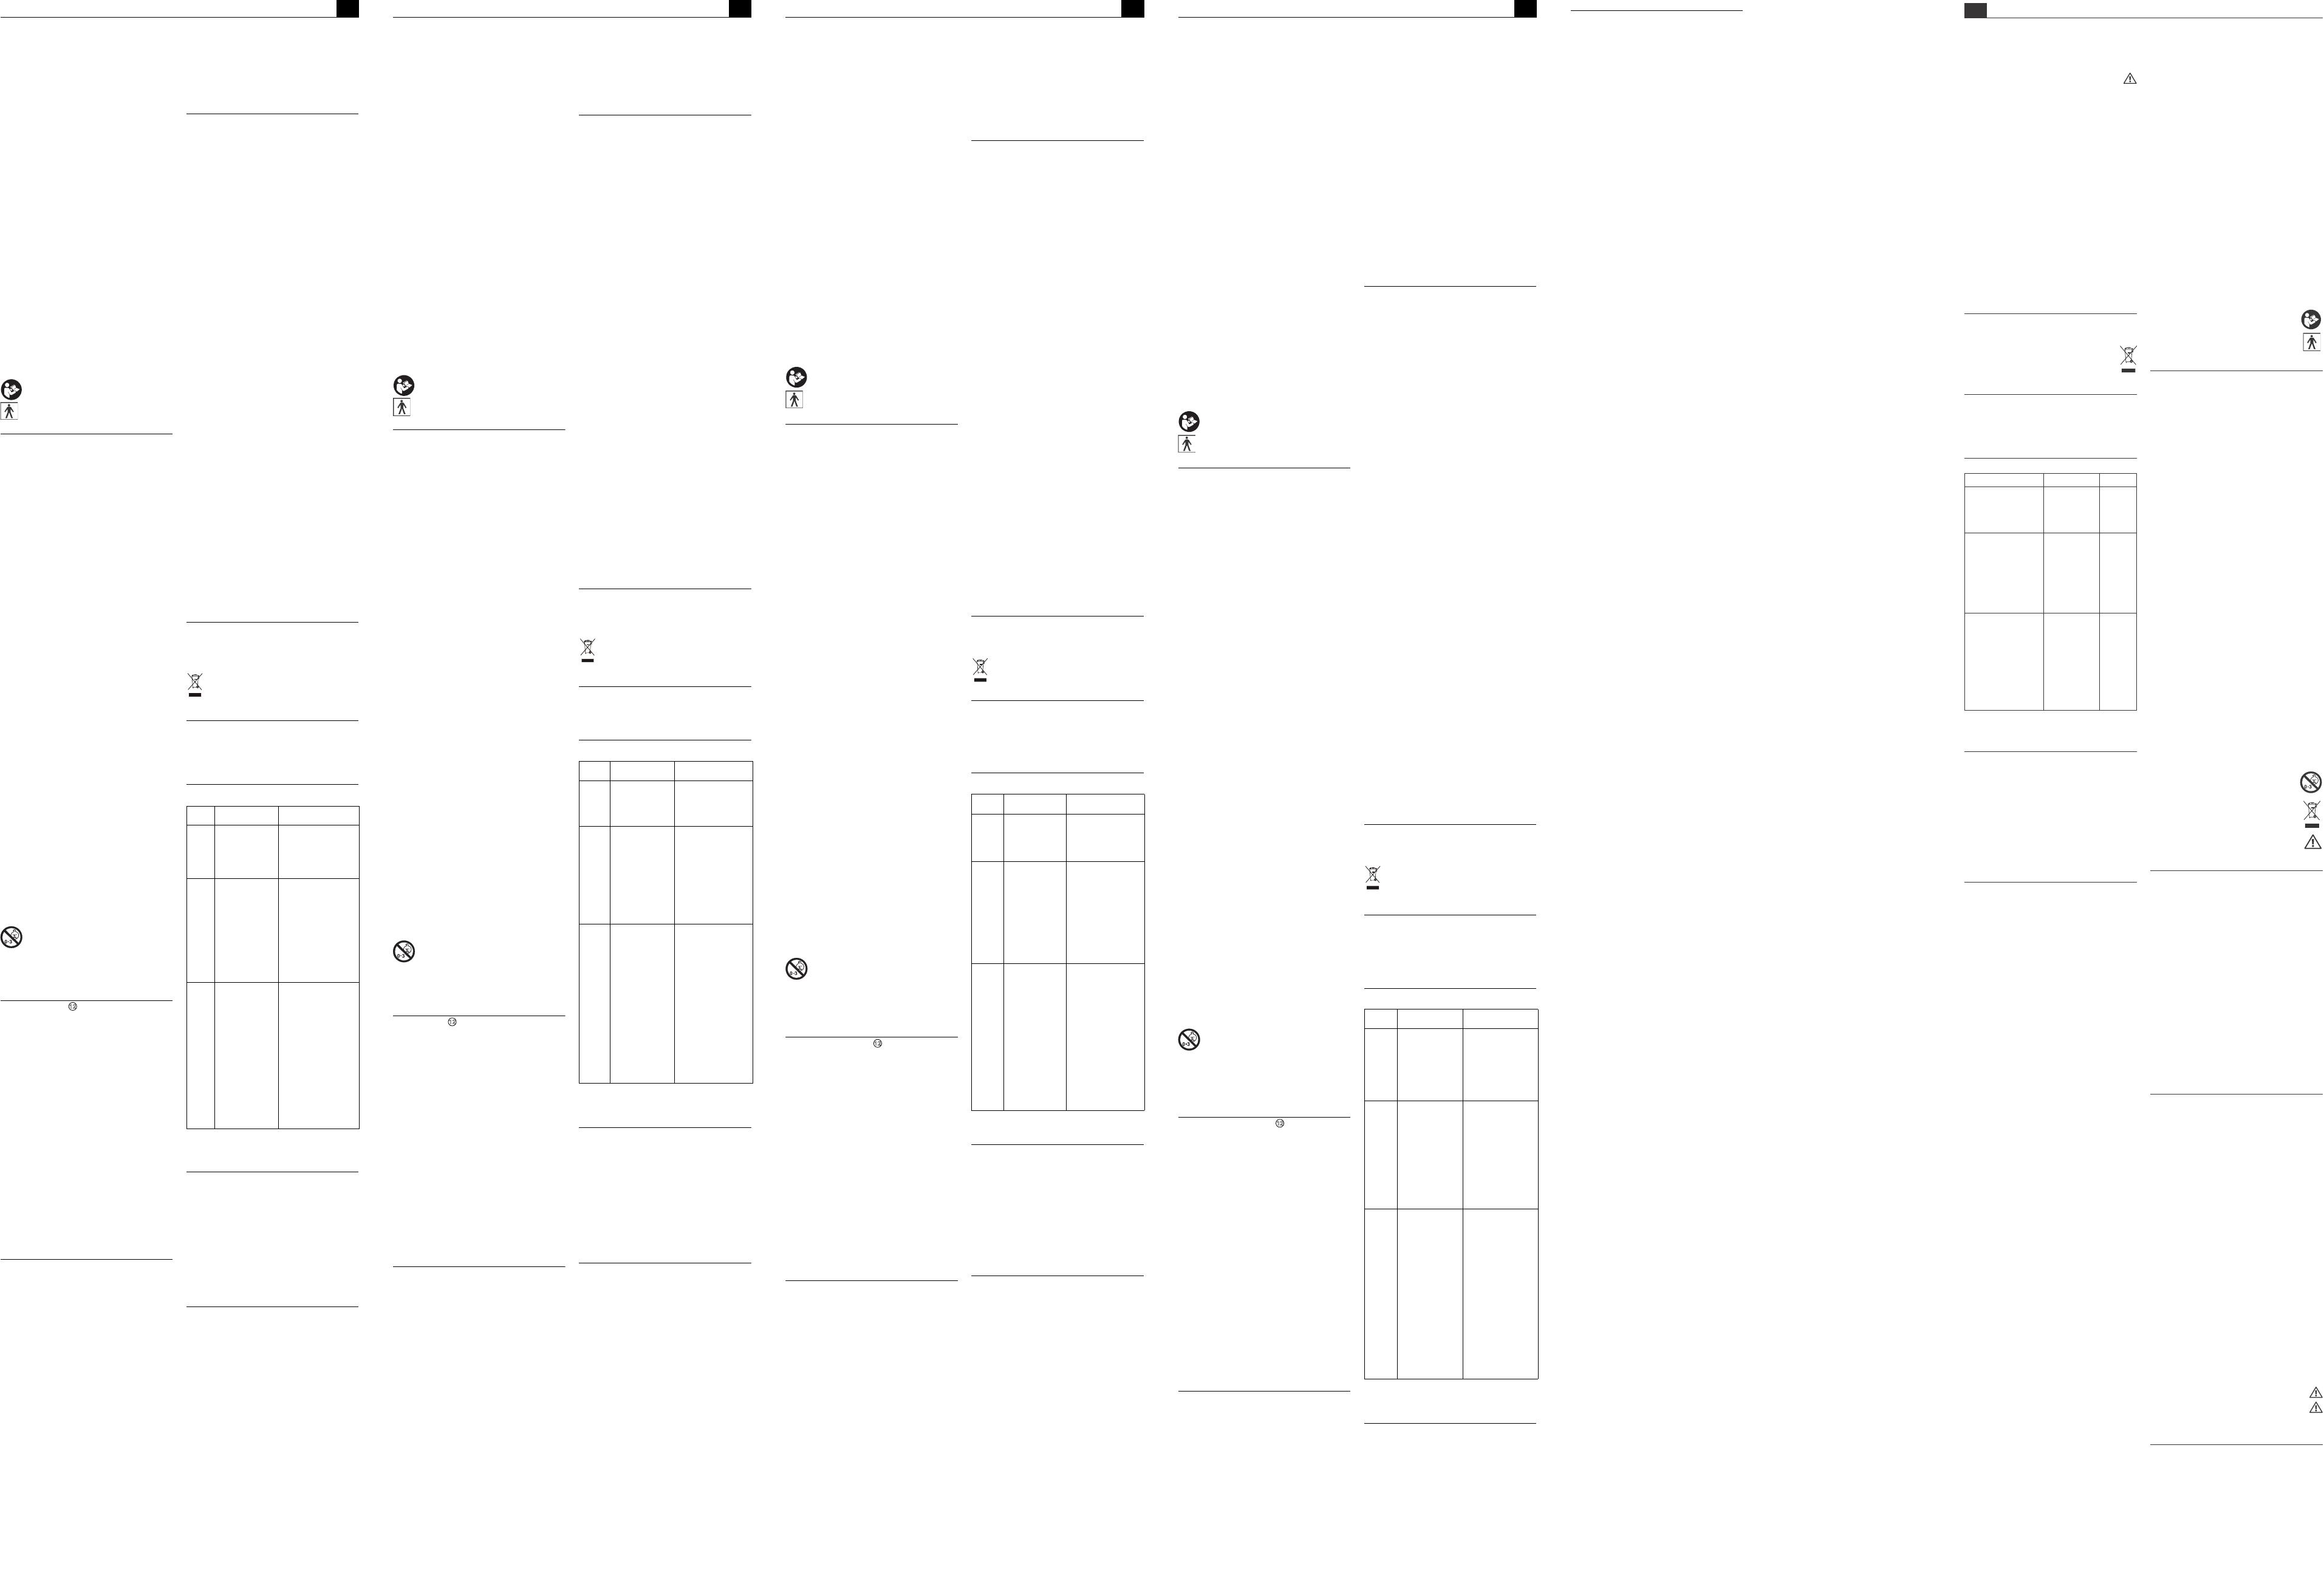 Manual Microlife NEB 199 (page 19 of 19) (German, English, Spanish